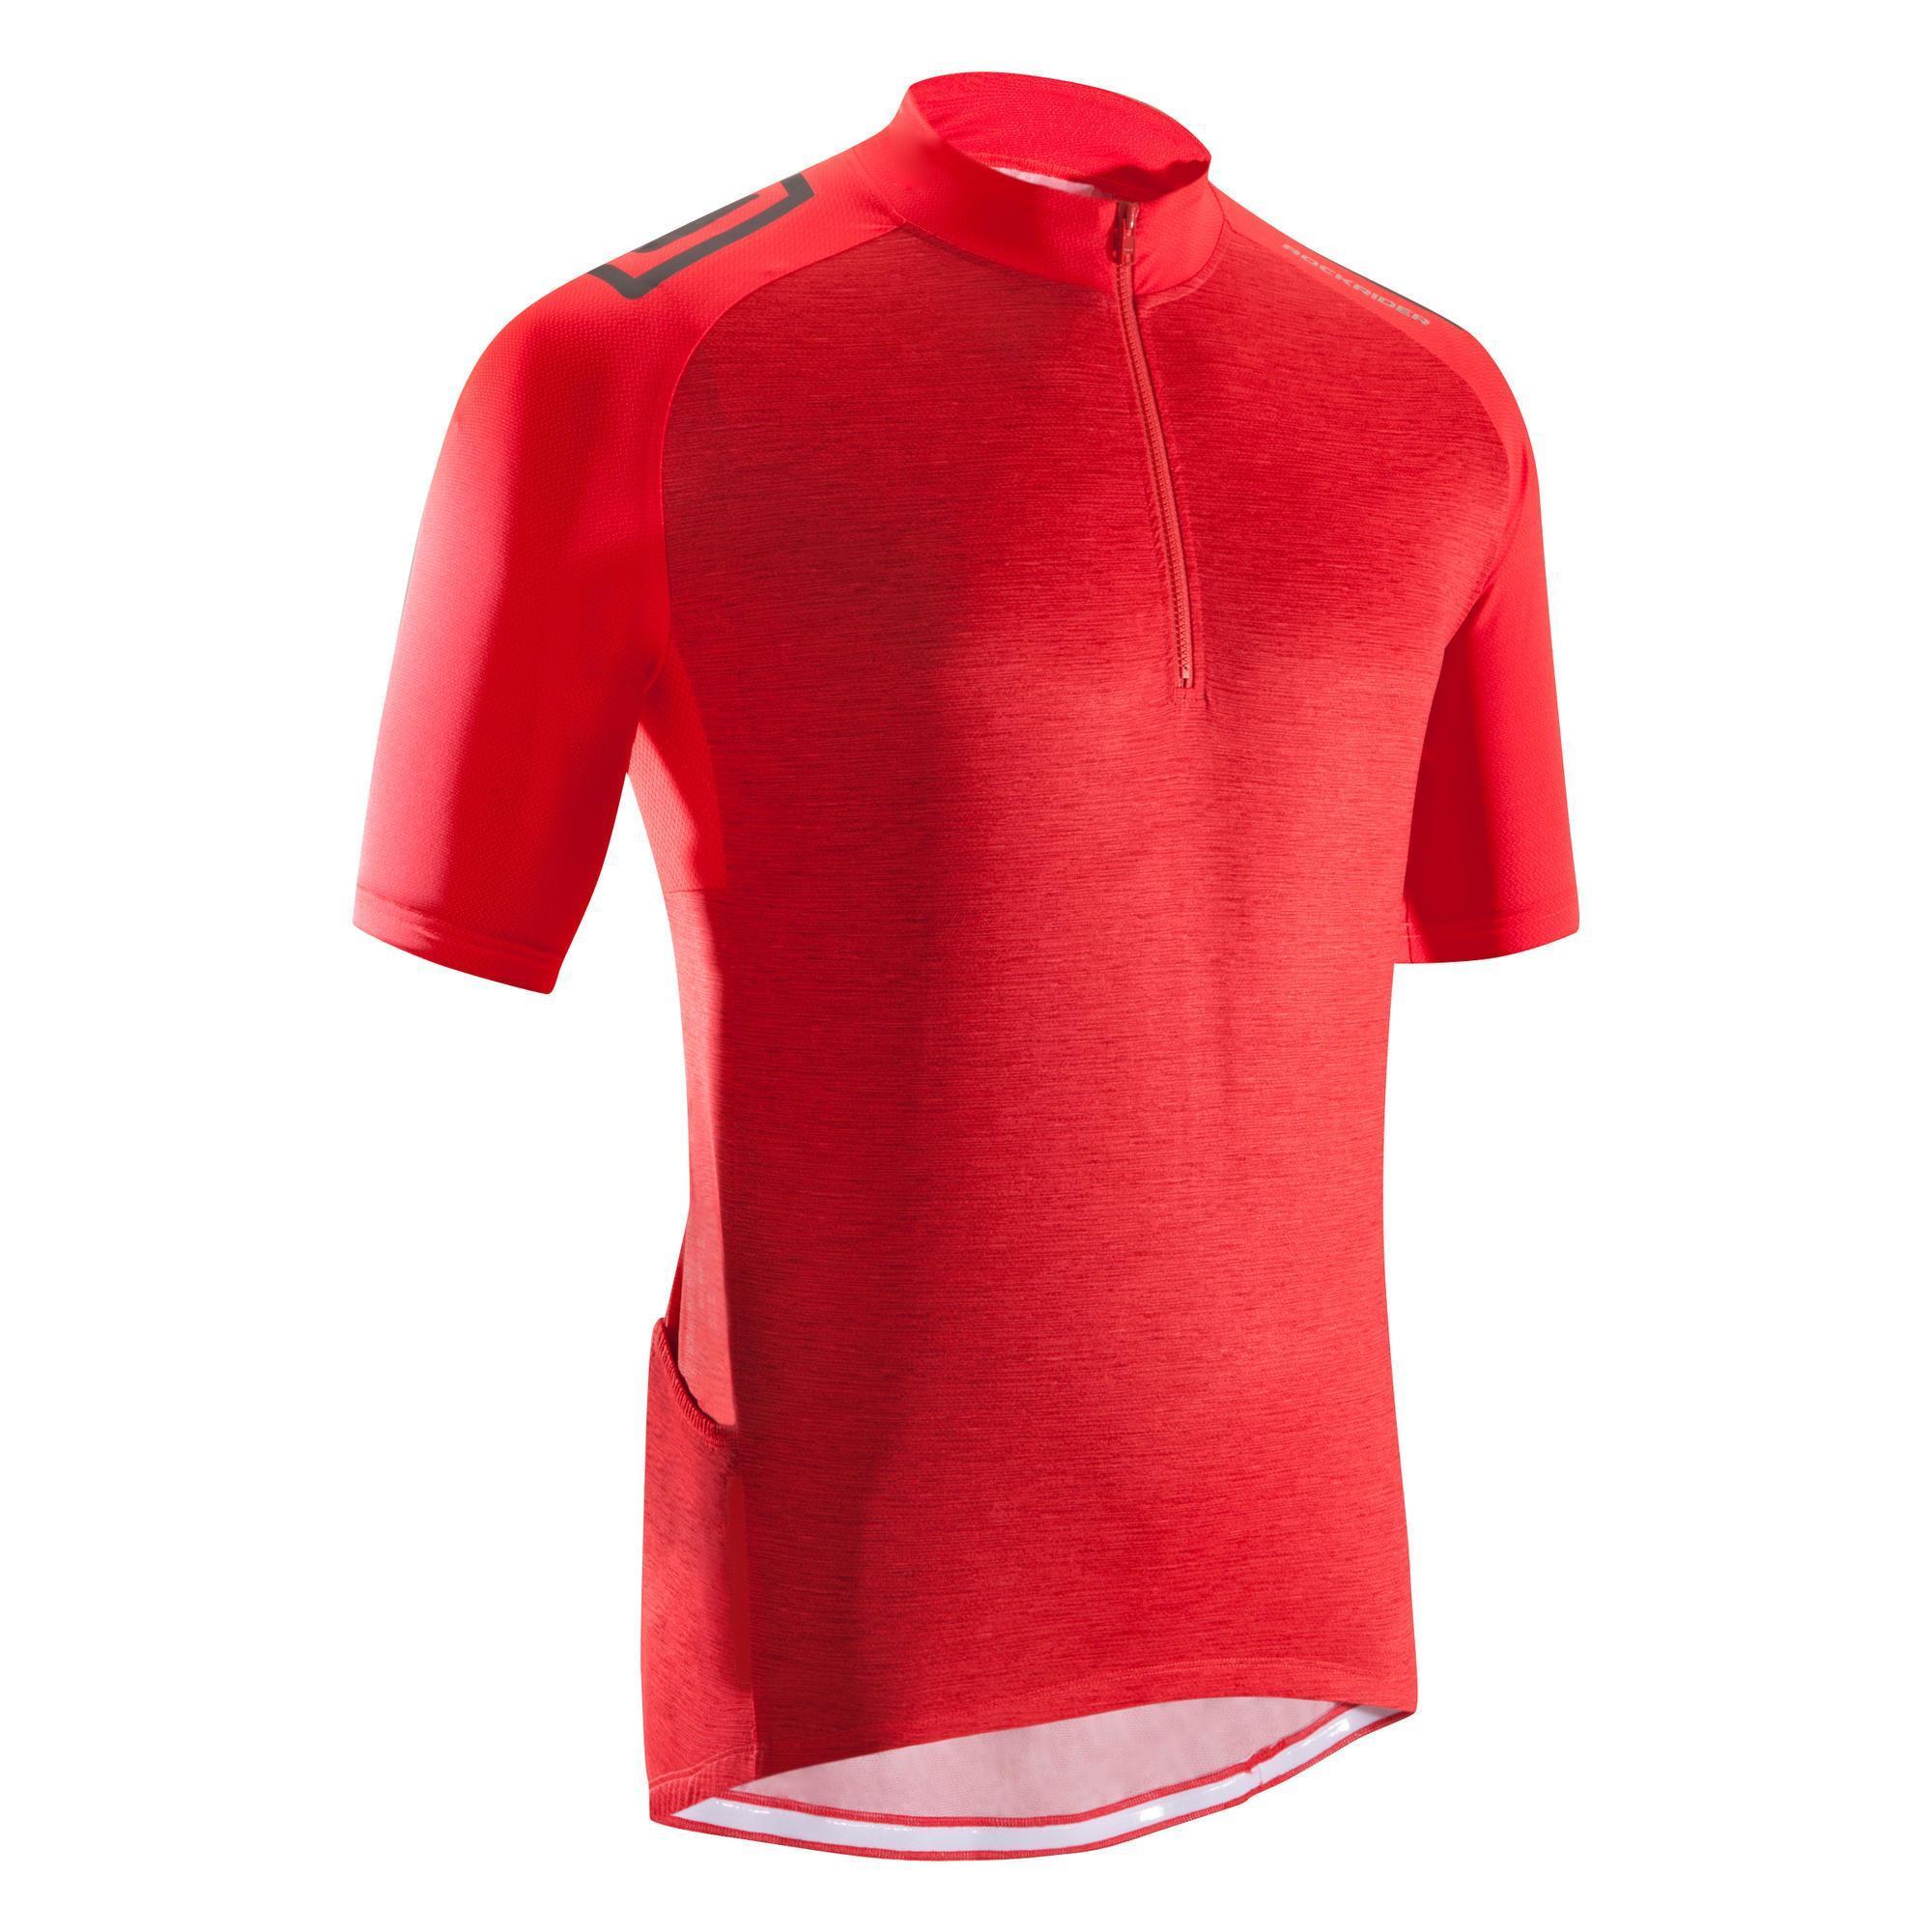 Fahrrad-Trikot MTB ST 500 Herren fluo rot   Sportbekleidung > Trikots > Fahrradtrikots   Rot - Bordeaux - Schwarz   Baumwolle   Rockrider